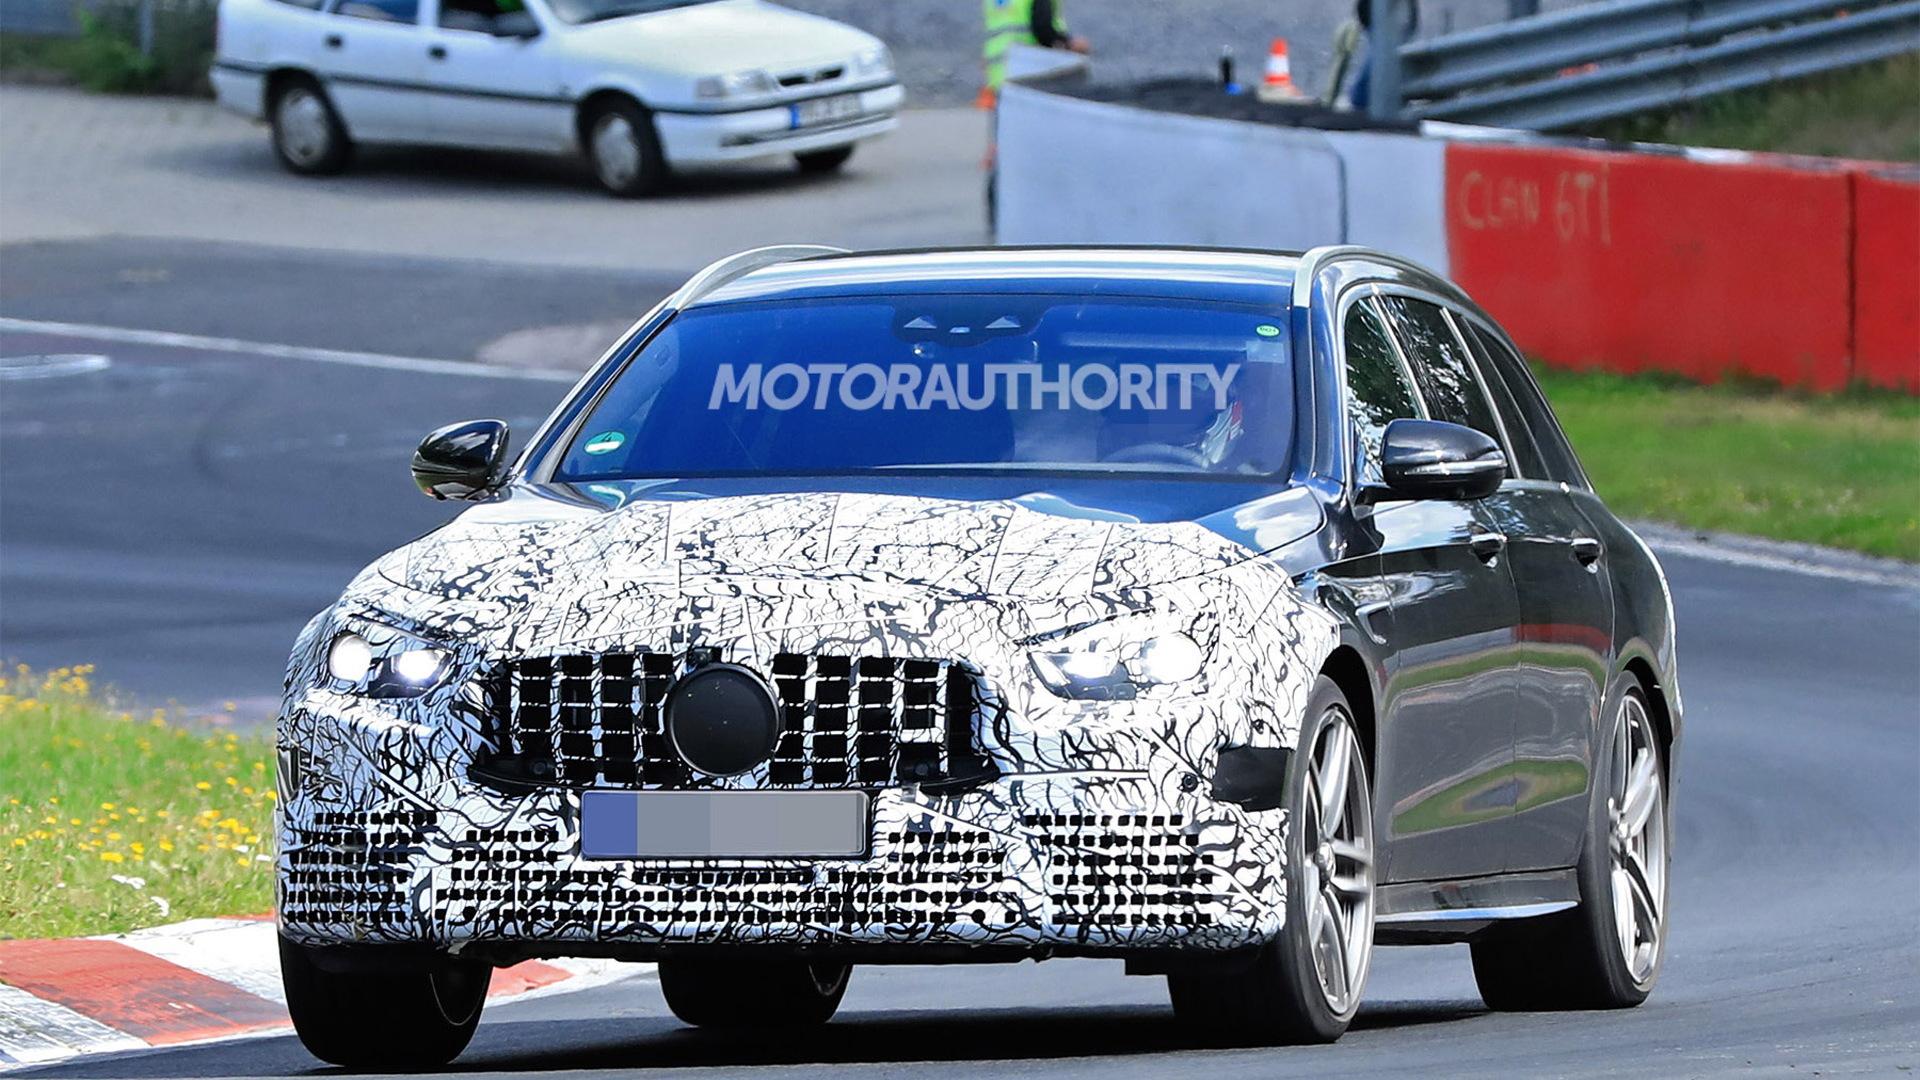 2021 Mercedes-AMG E63 Wagon facelift spy shots - Photo credit: S. Baldauf/SB-Medien